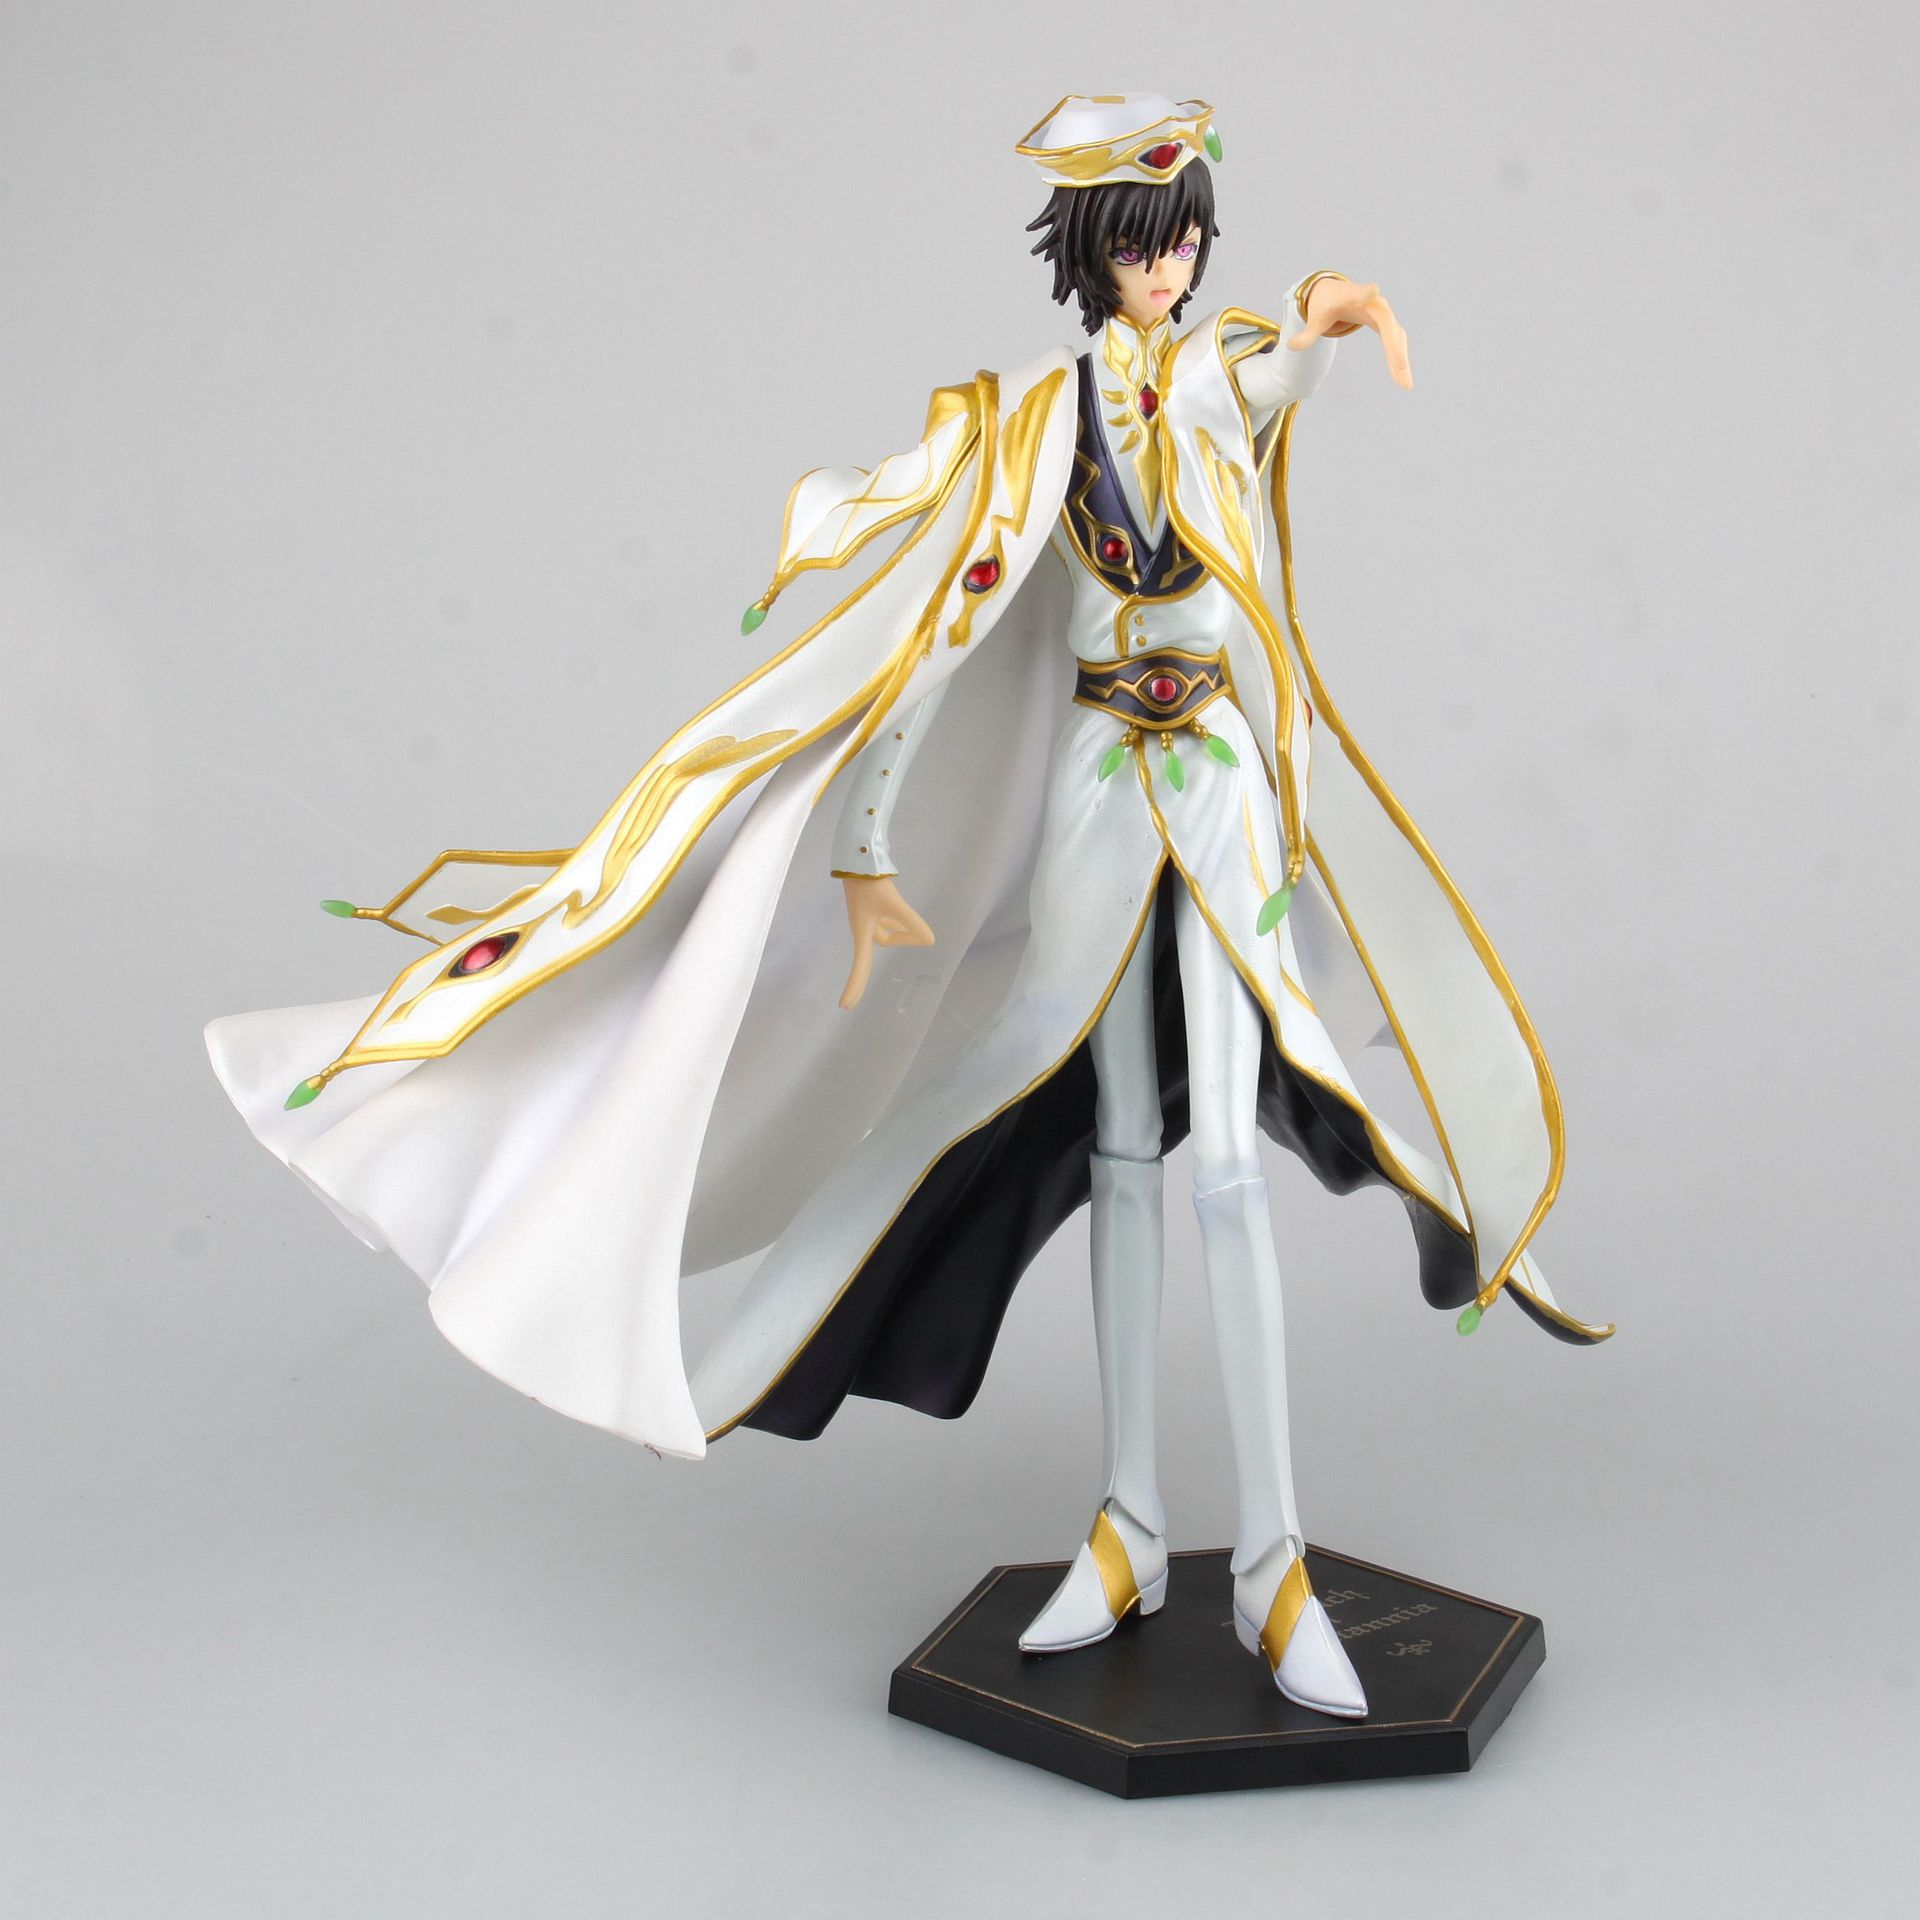 Аниме код Geass R2 Lelouch Lamperouge Britannia Knight of Seven Emperor белый плащ Ver ПВХ 24 см экшн-фигурка кукла абсолютно новая